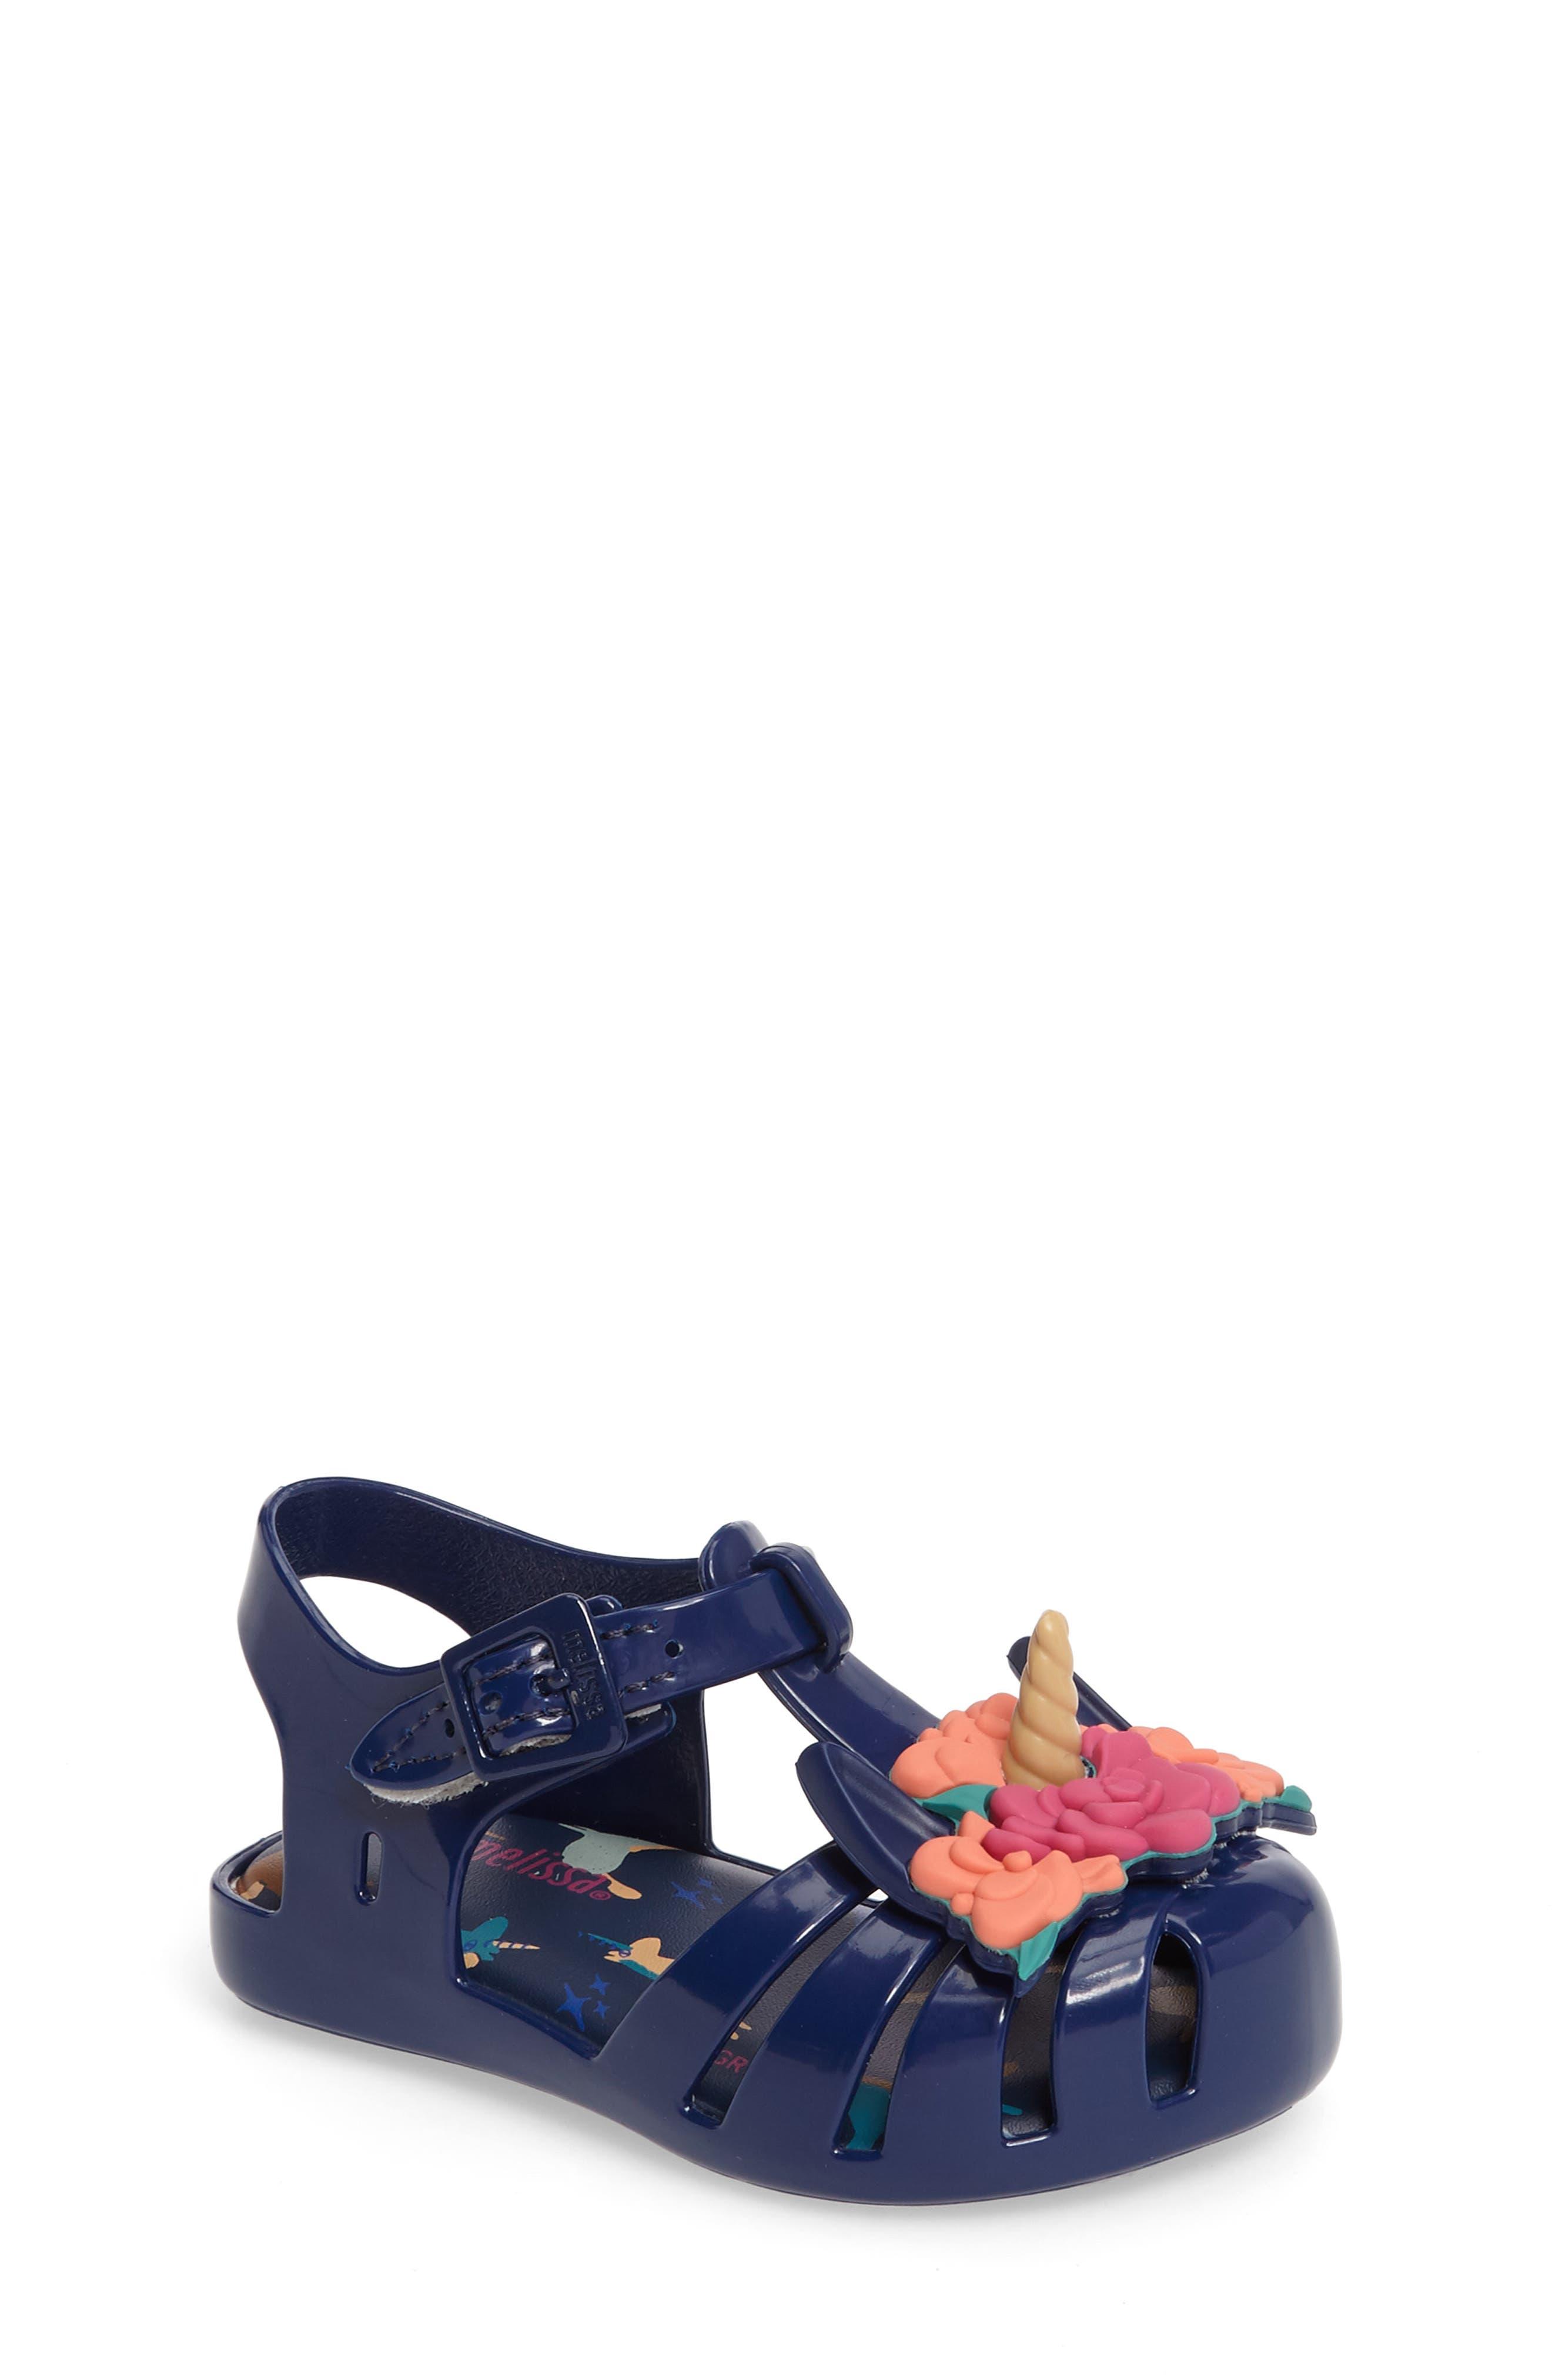 Mini Melissa Aranha Fabula Unicorn Sandal (Walker & Toddler)